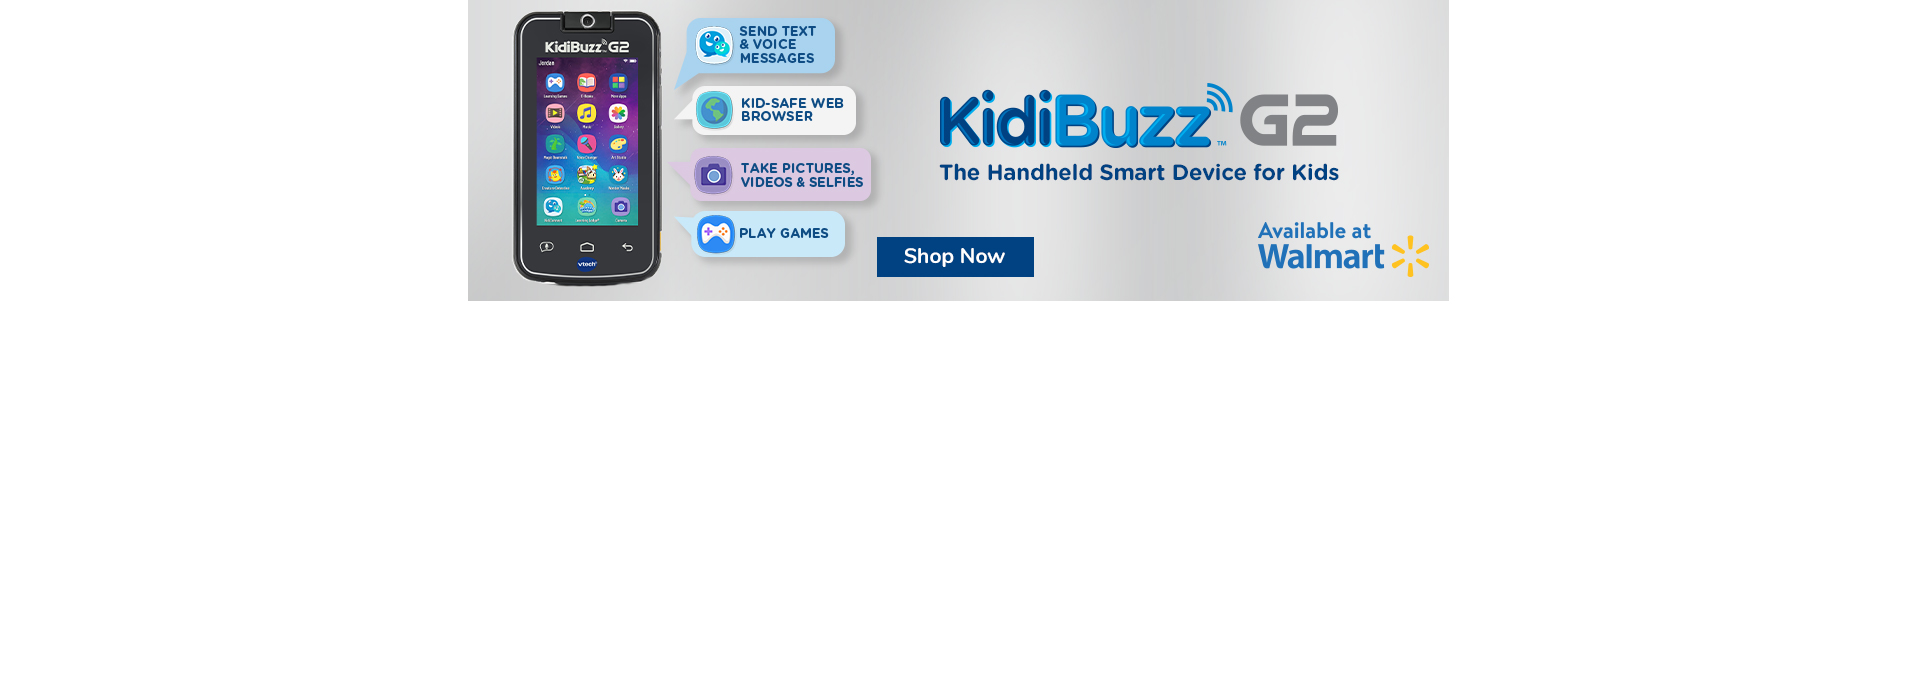 KidiBuzz G2 - Buy Now at Walmart